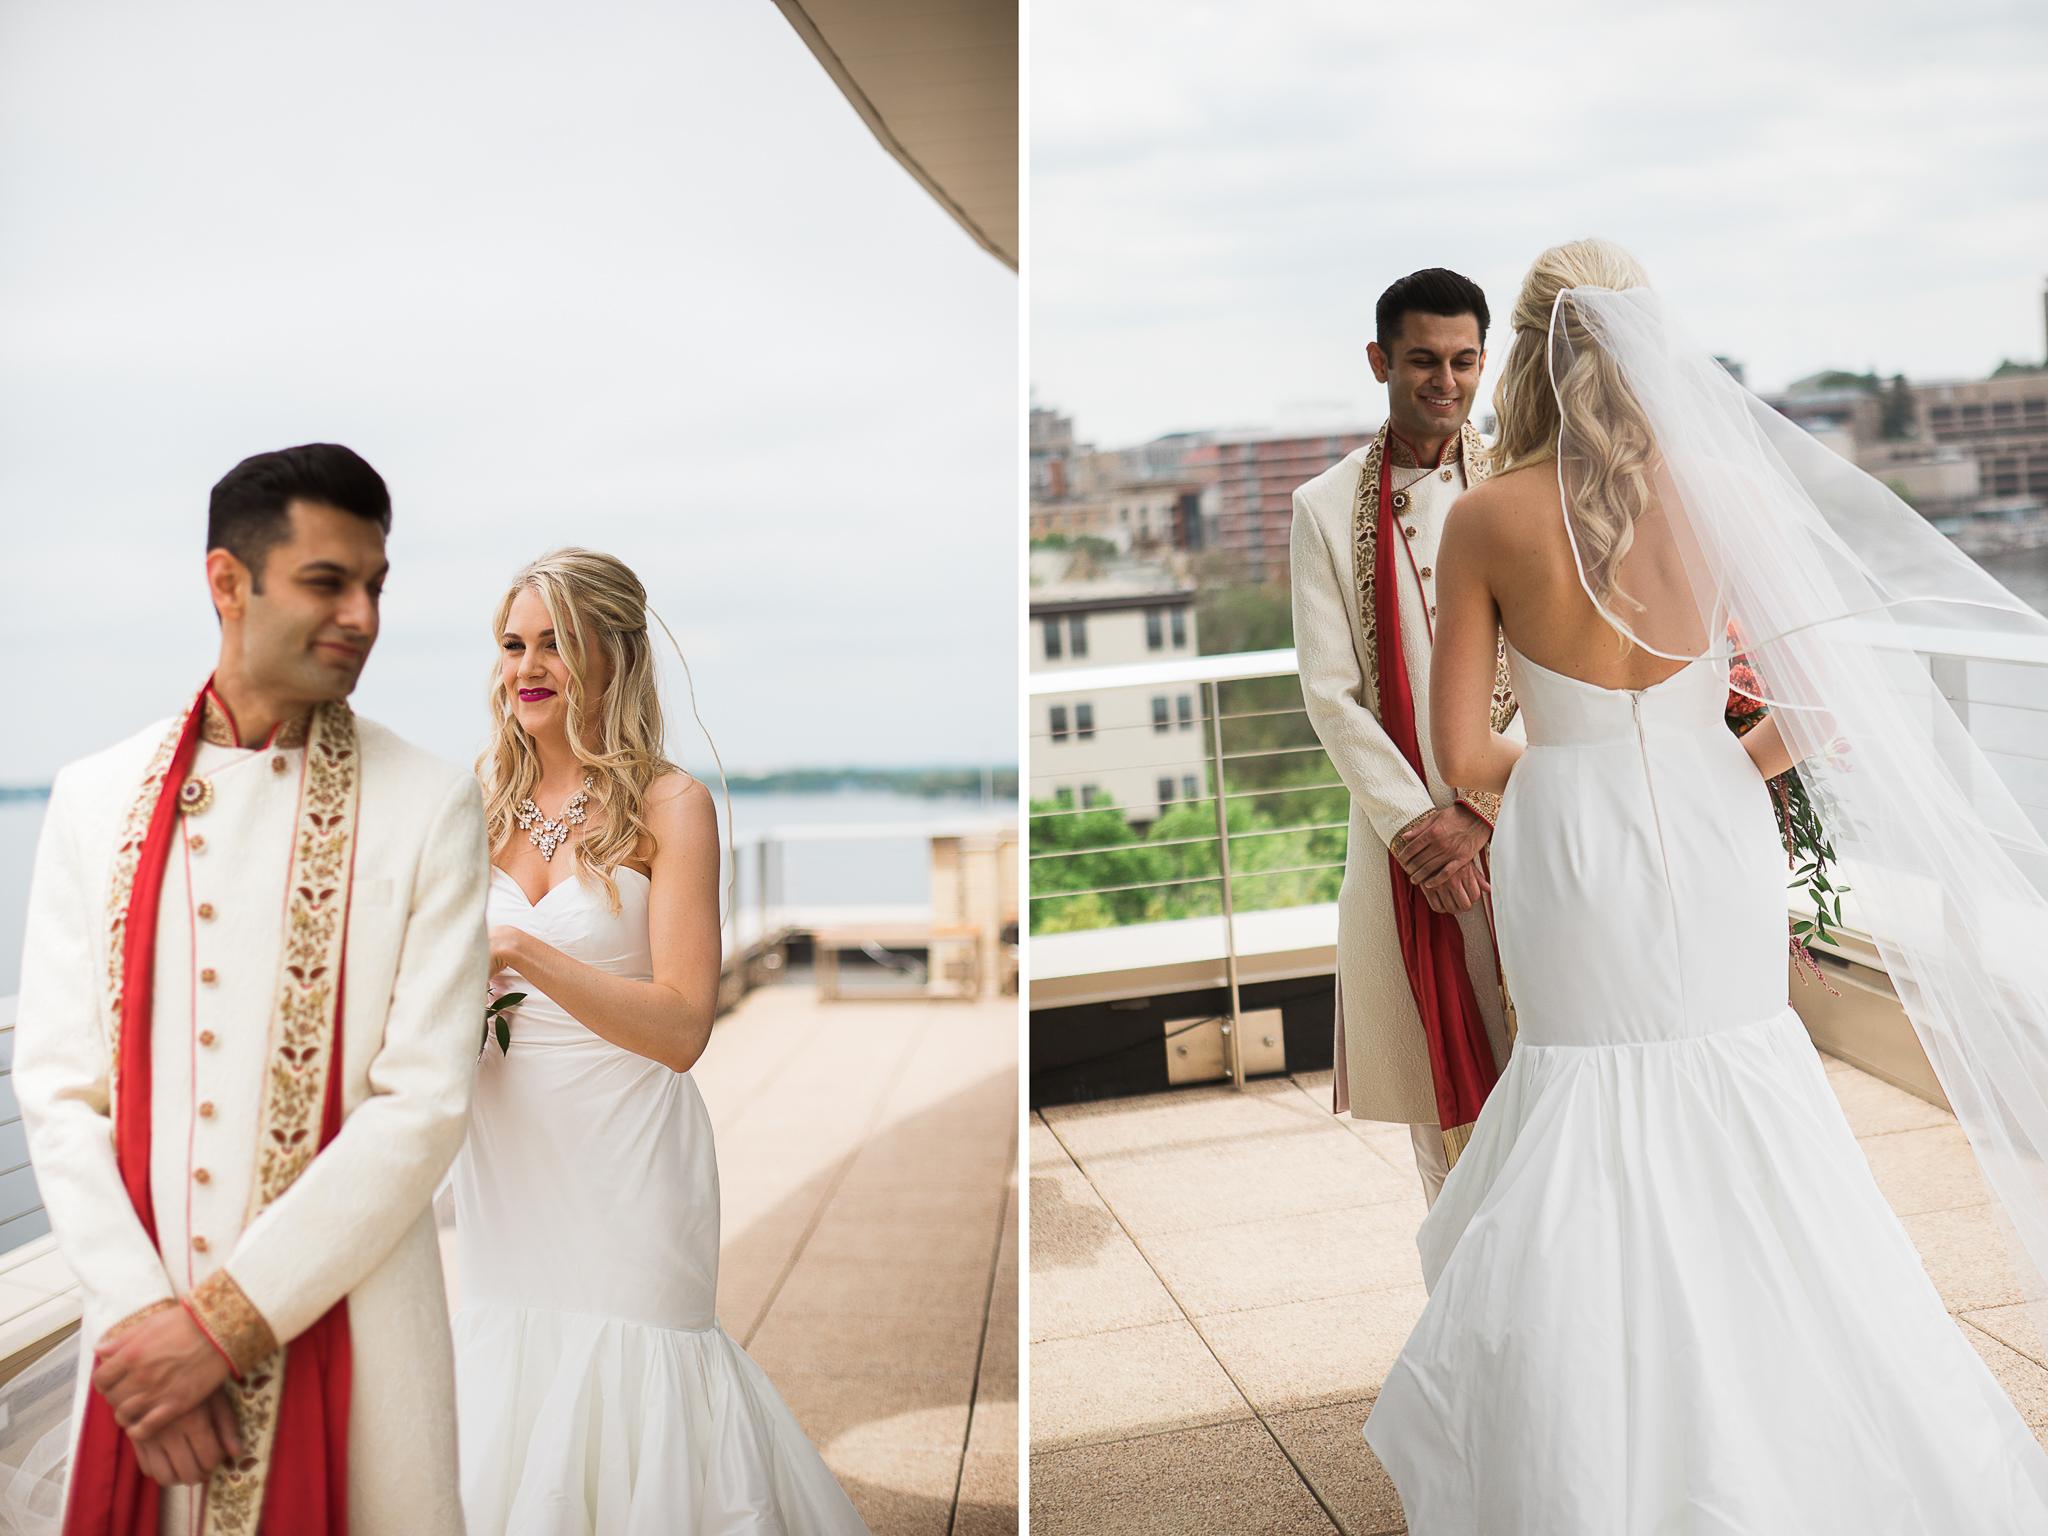 Indian-Fusion-wedding-Madison-Wisconsin_032.jpg